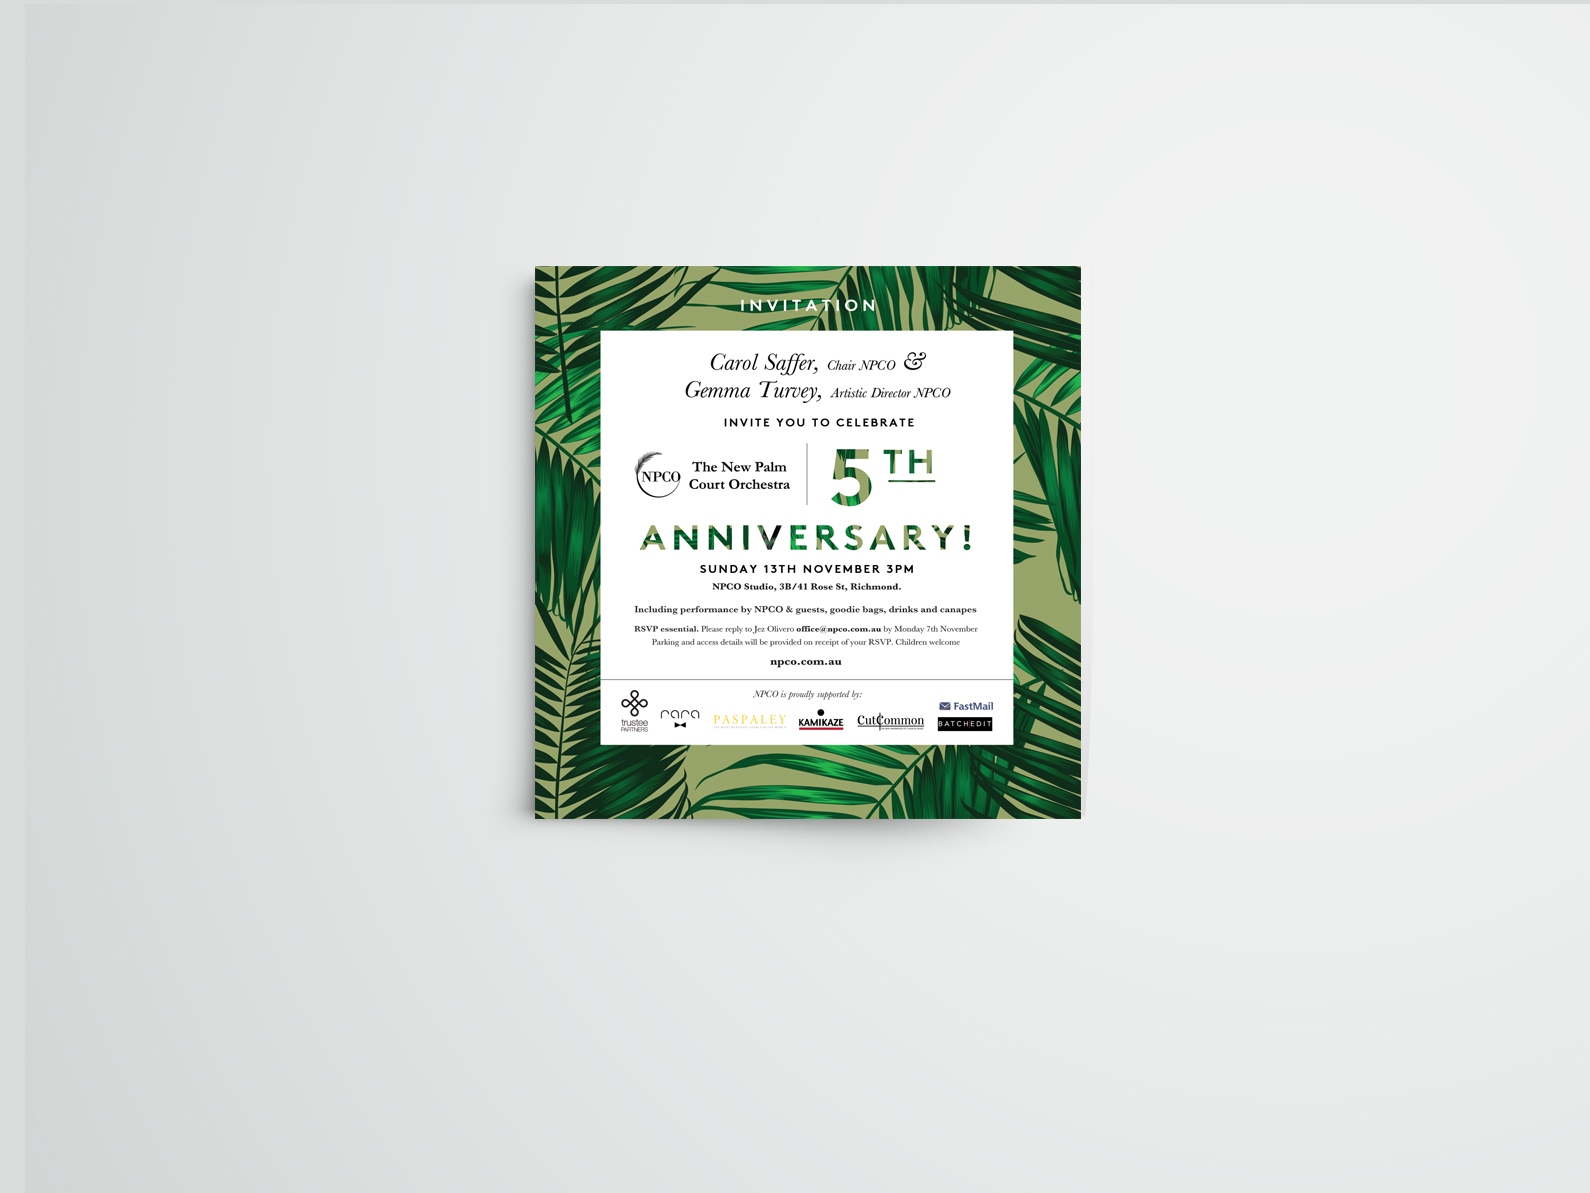 Studio-Mimi-Moon-New-Palm-Court-Orchestra-Brand-Identity-and-collateral-Invite